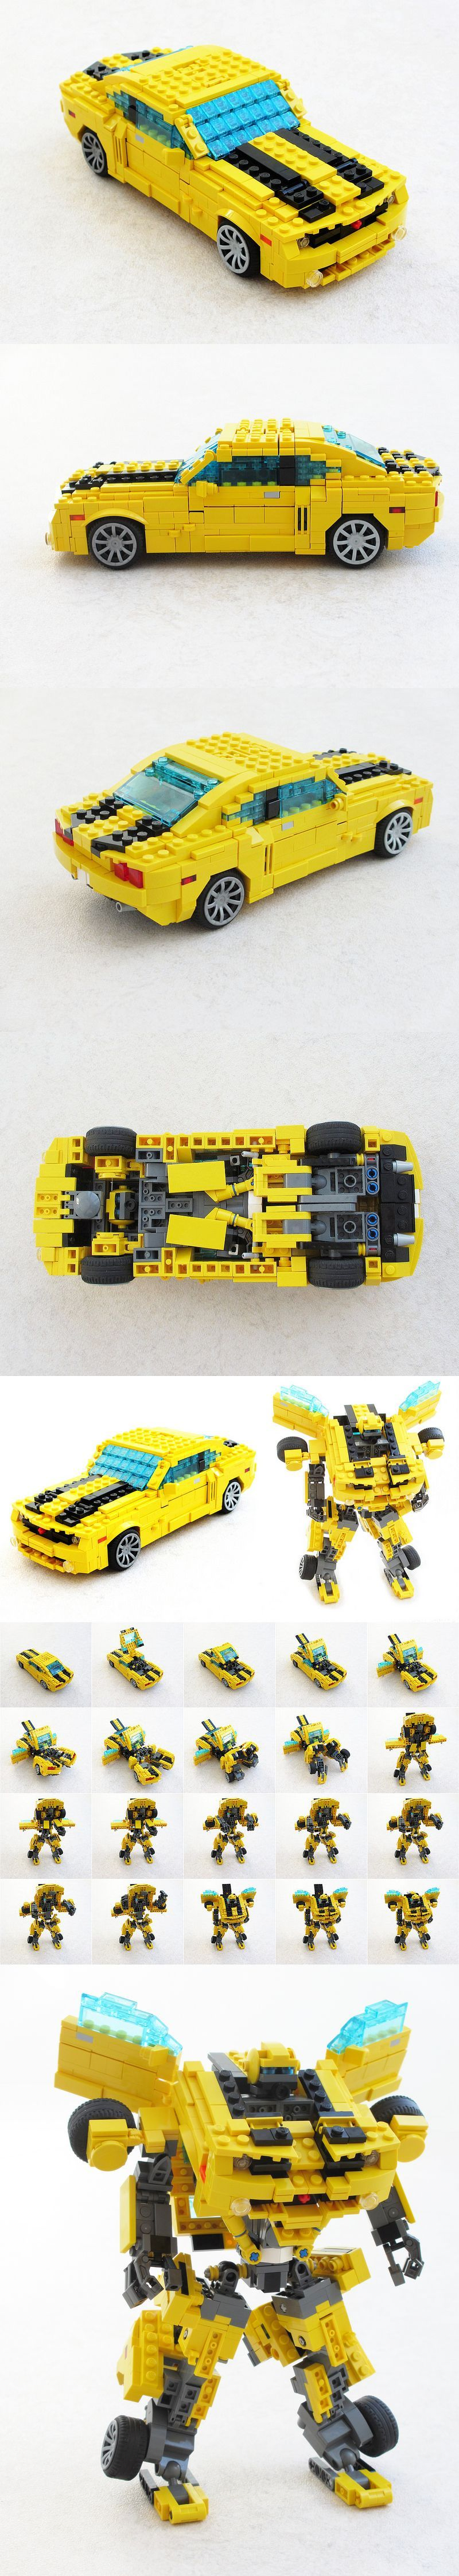 Bumblebee3Lego Et TransformersLegos Toys Bumblebee3Lego TransformersLegos Toys Et TransformersLegos Et Bumblebee3Lego Toys dCxBeWro